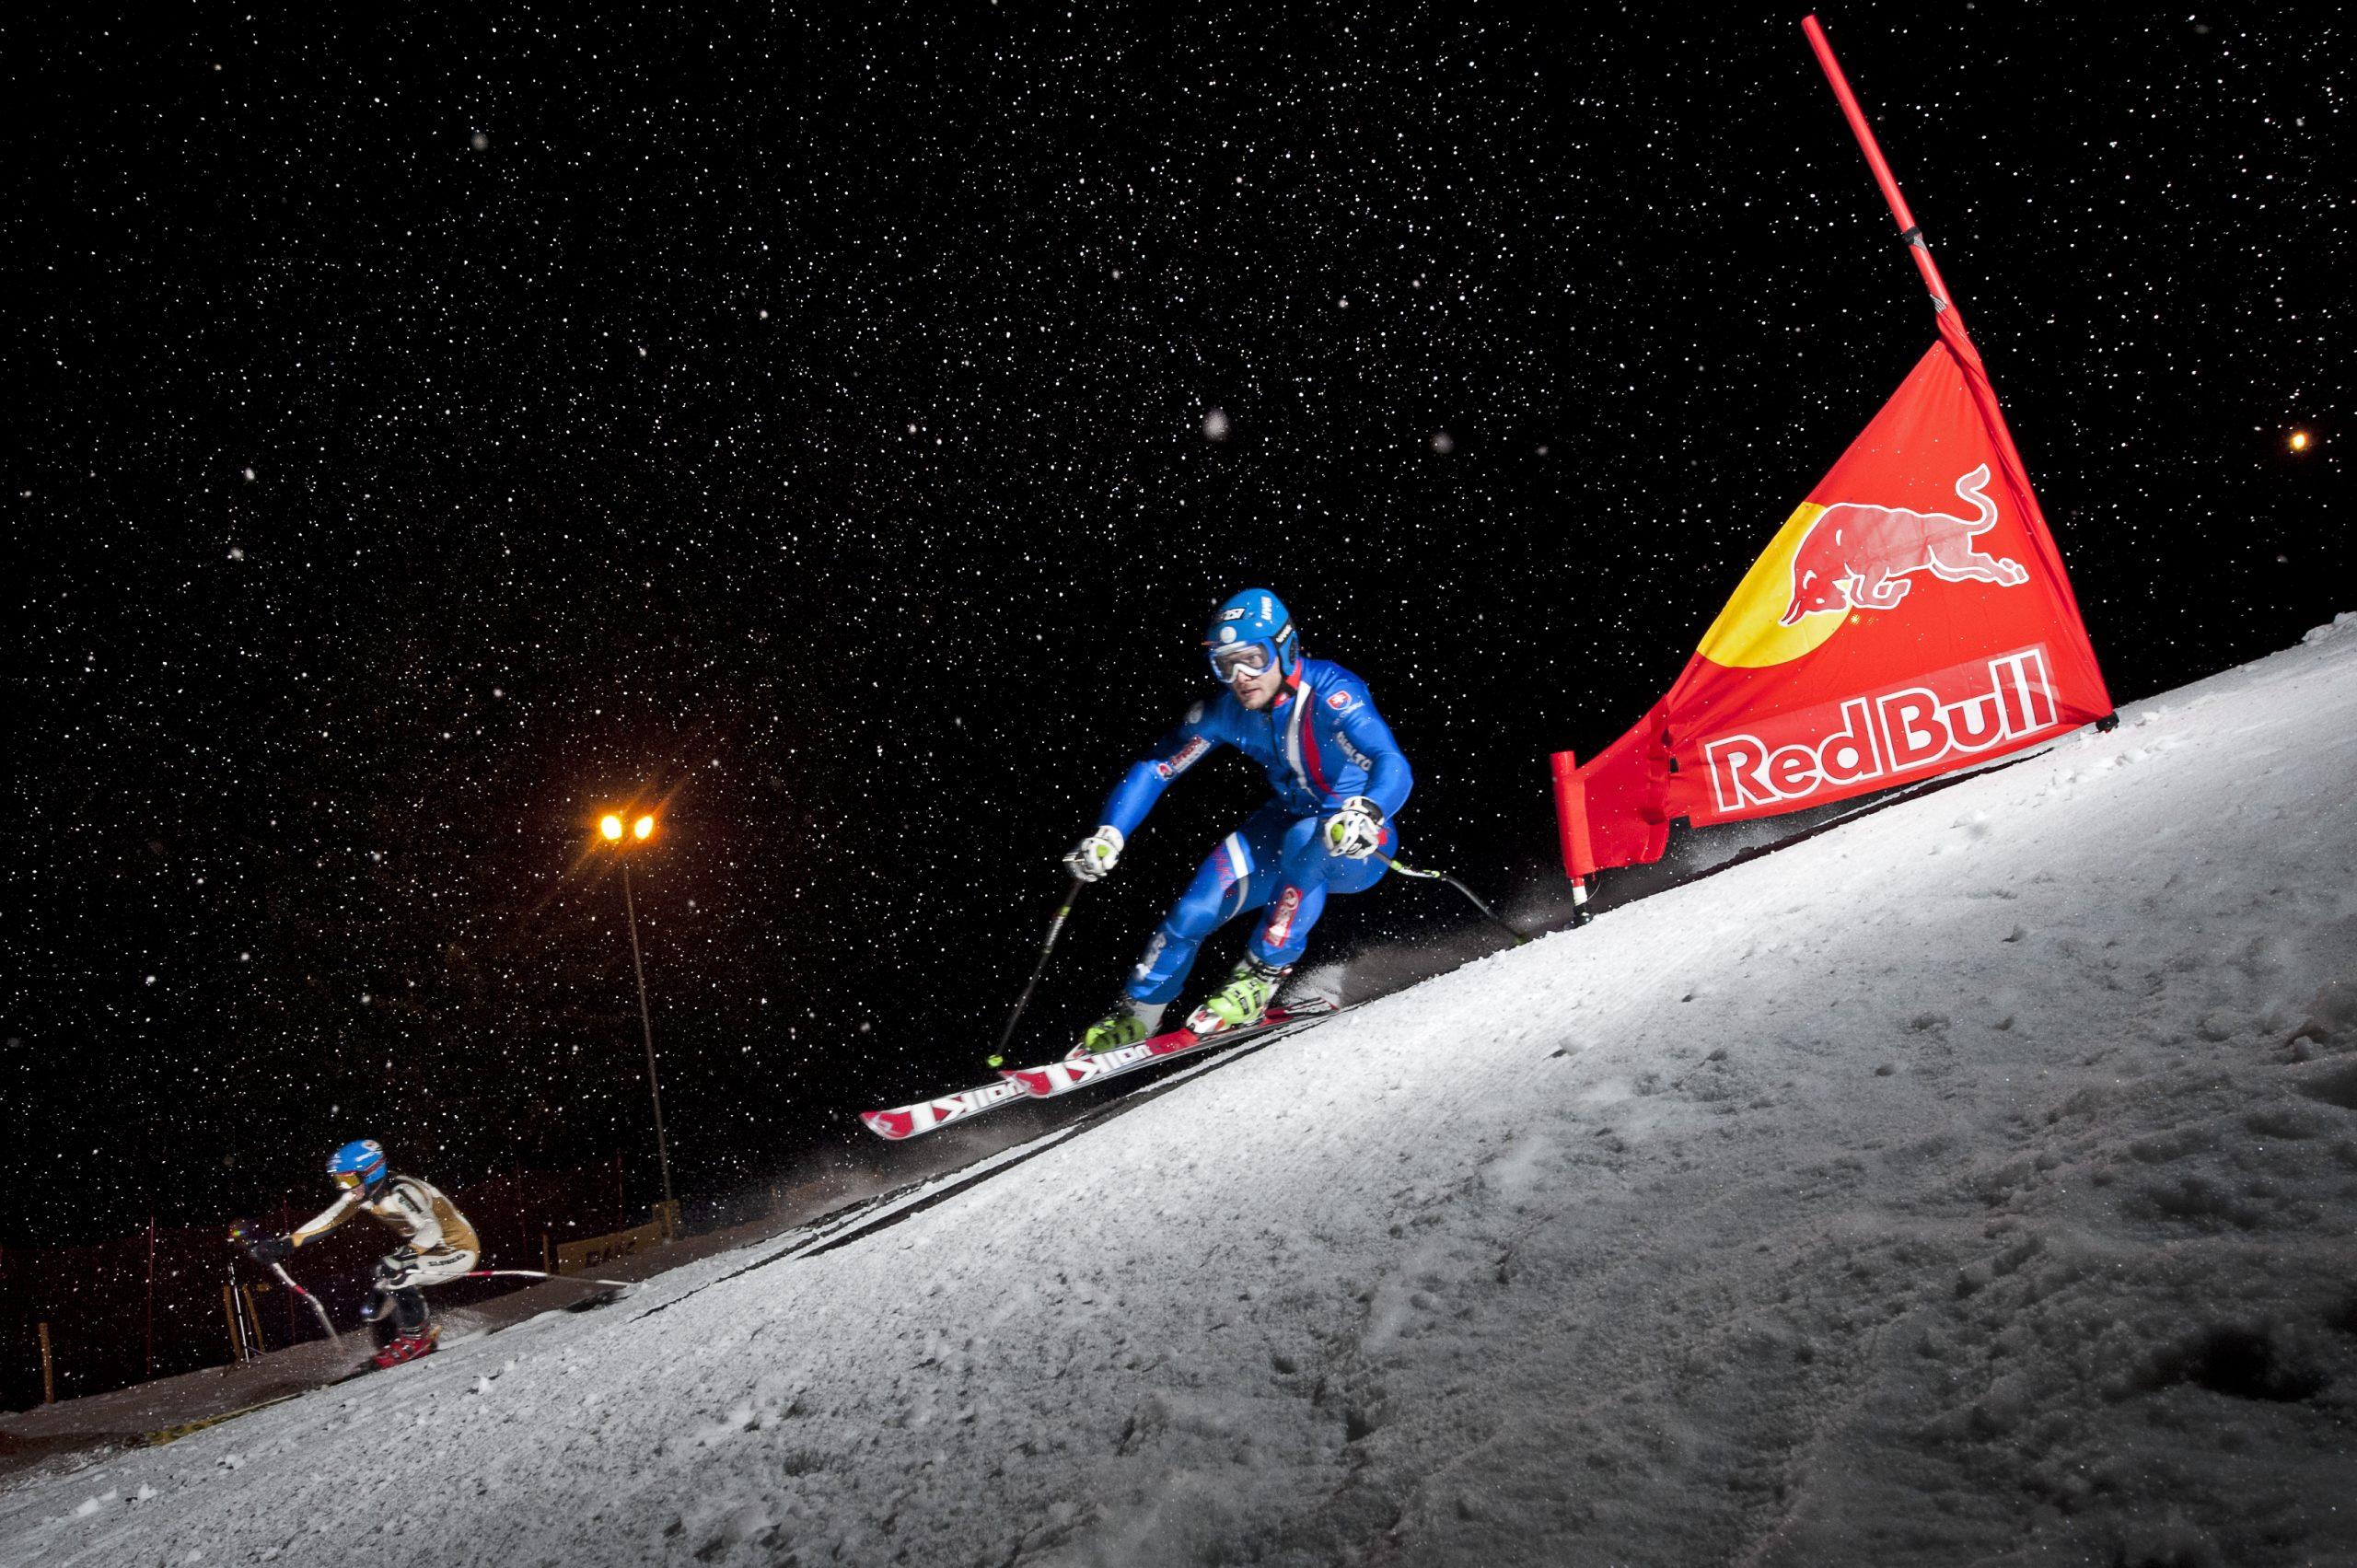 Photo: Lukasz Nazdraczew/Red Bull Content Pool